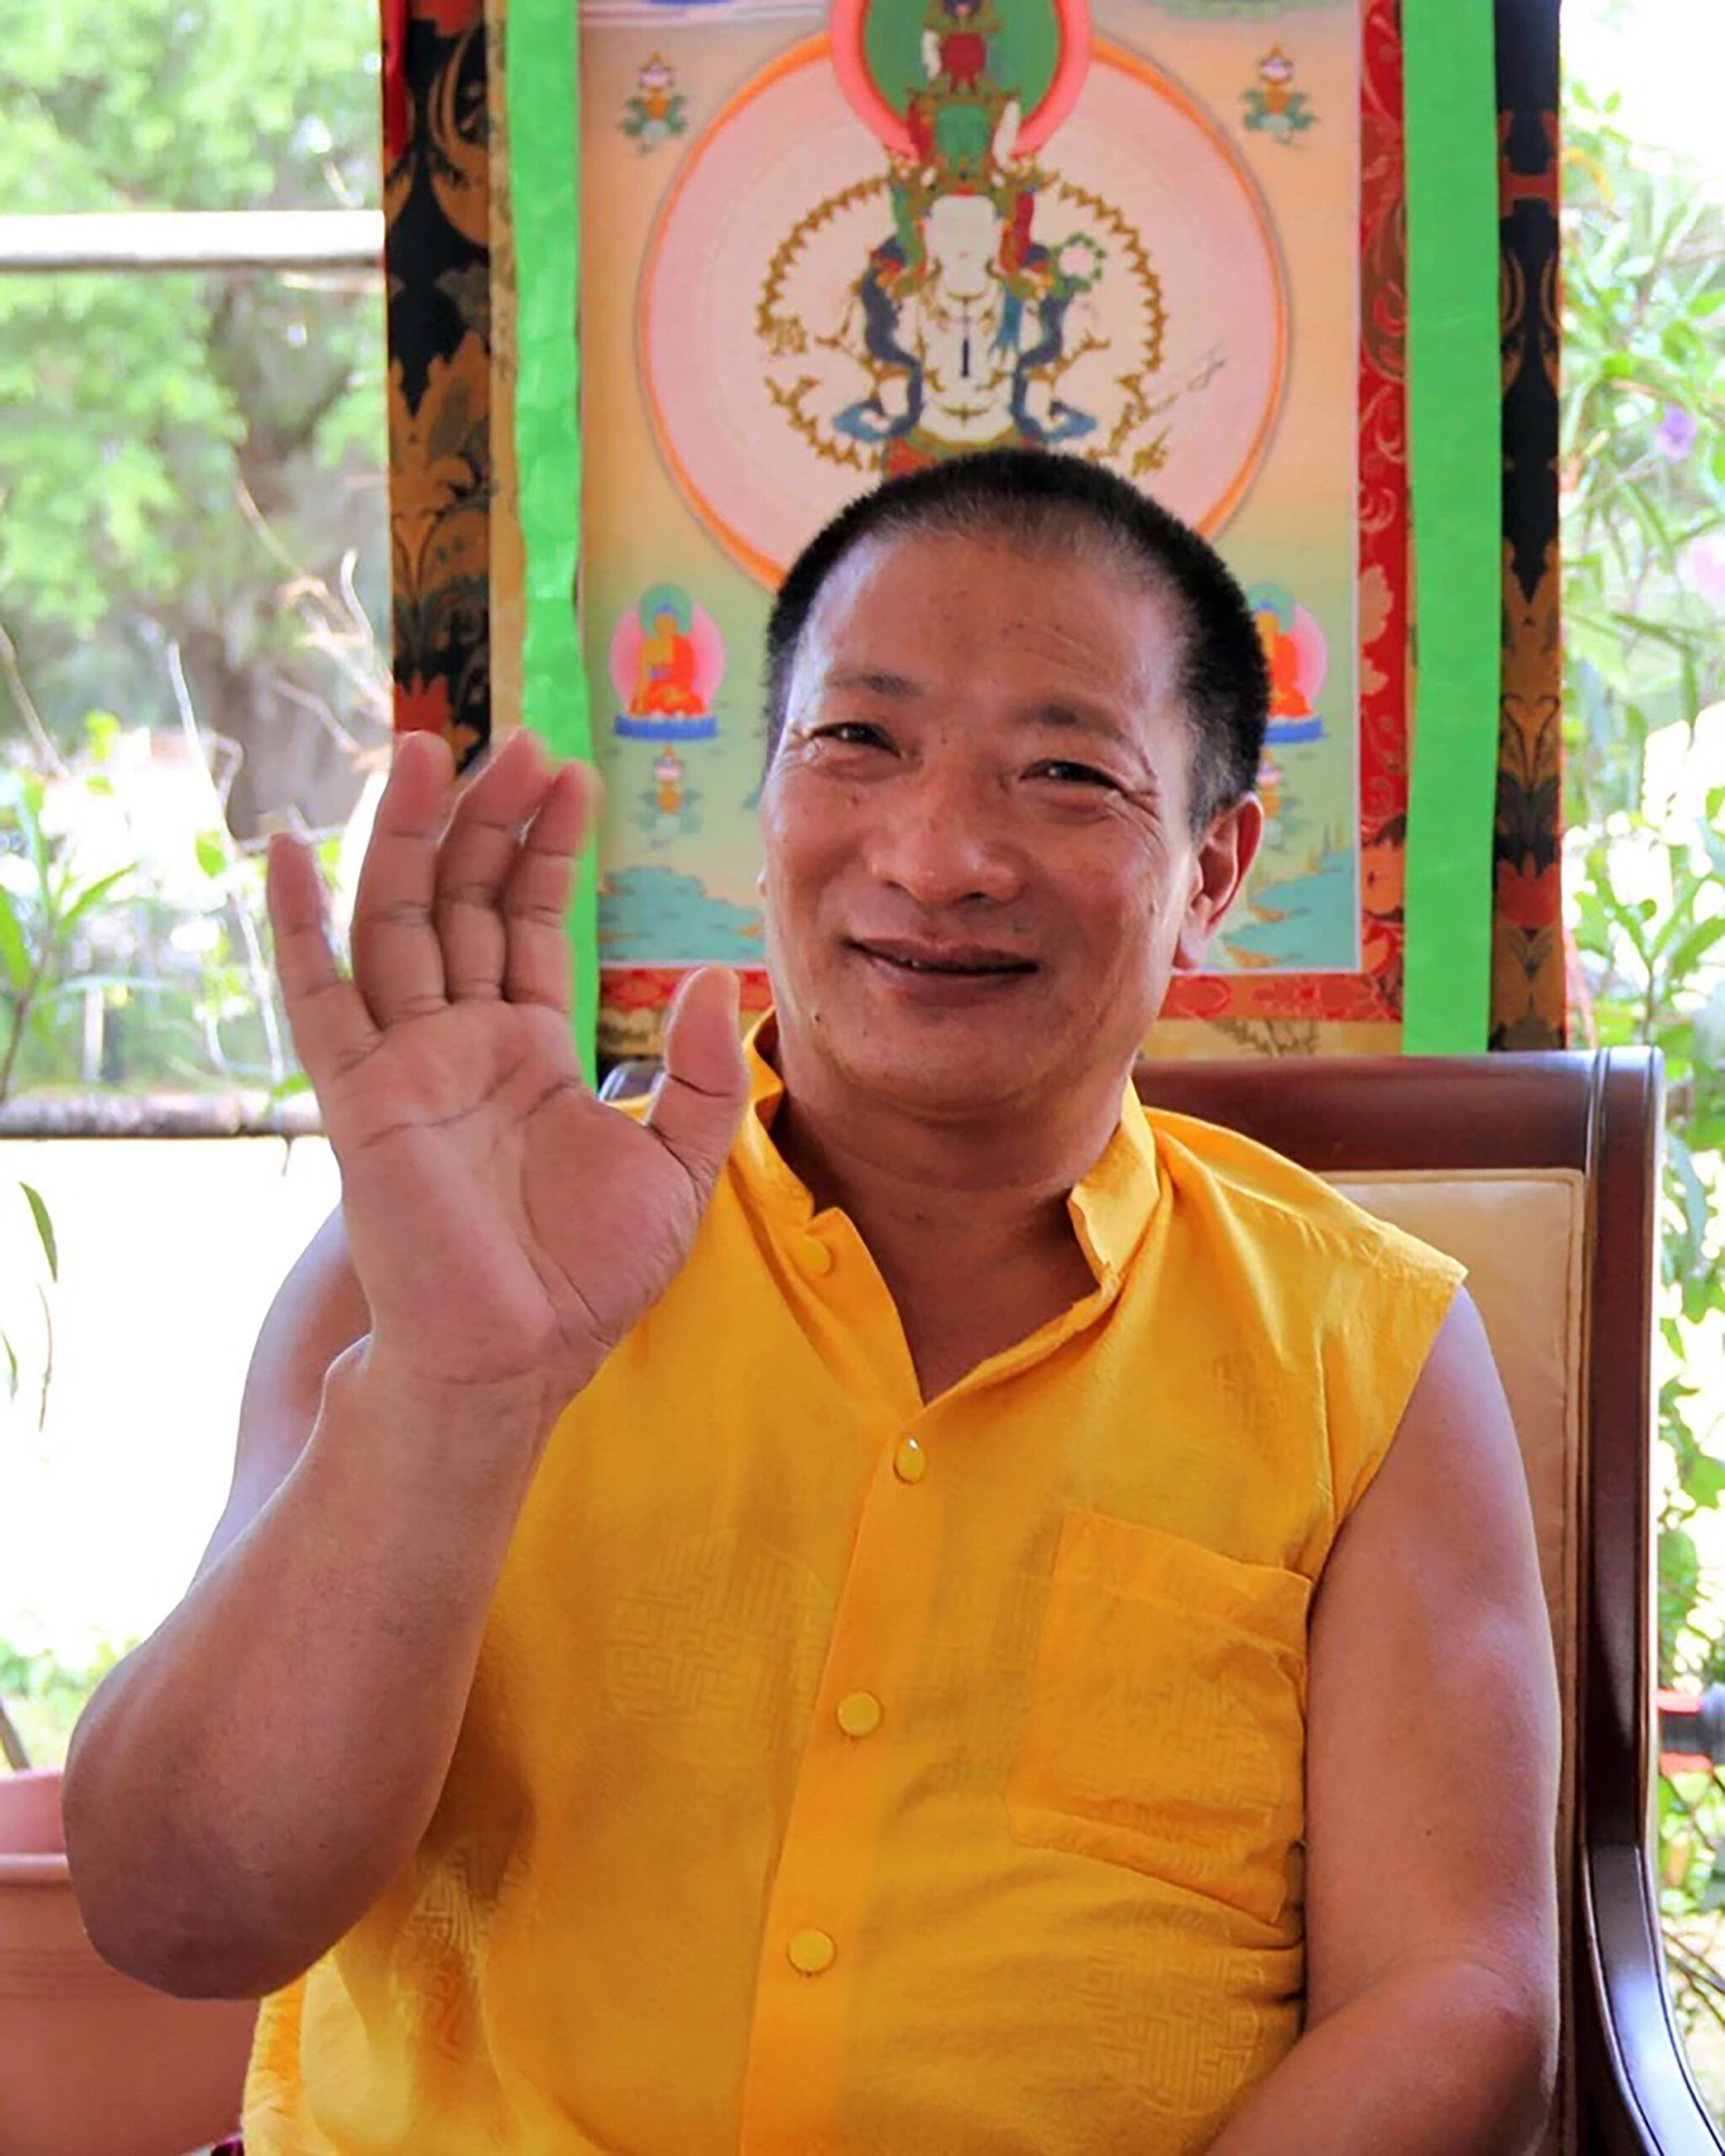 Venerable Drupon Thinley Ningpo Rinpoche